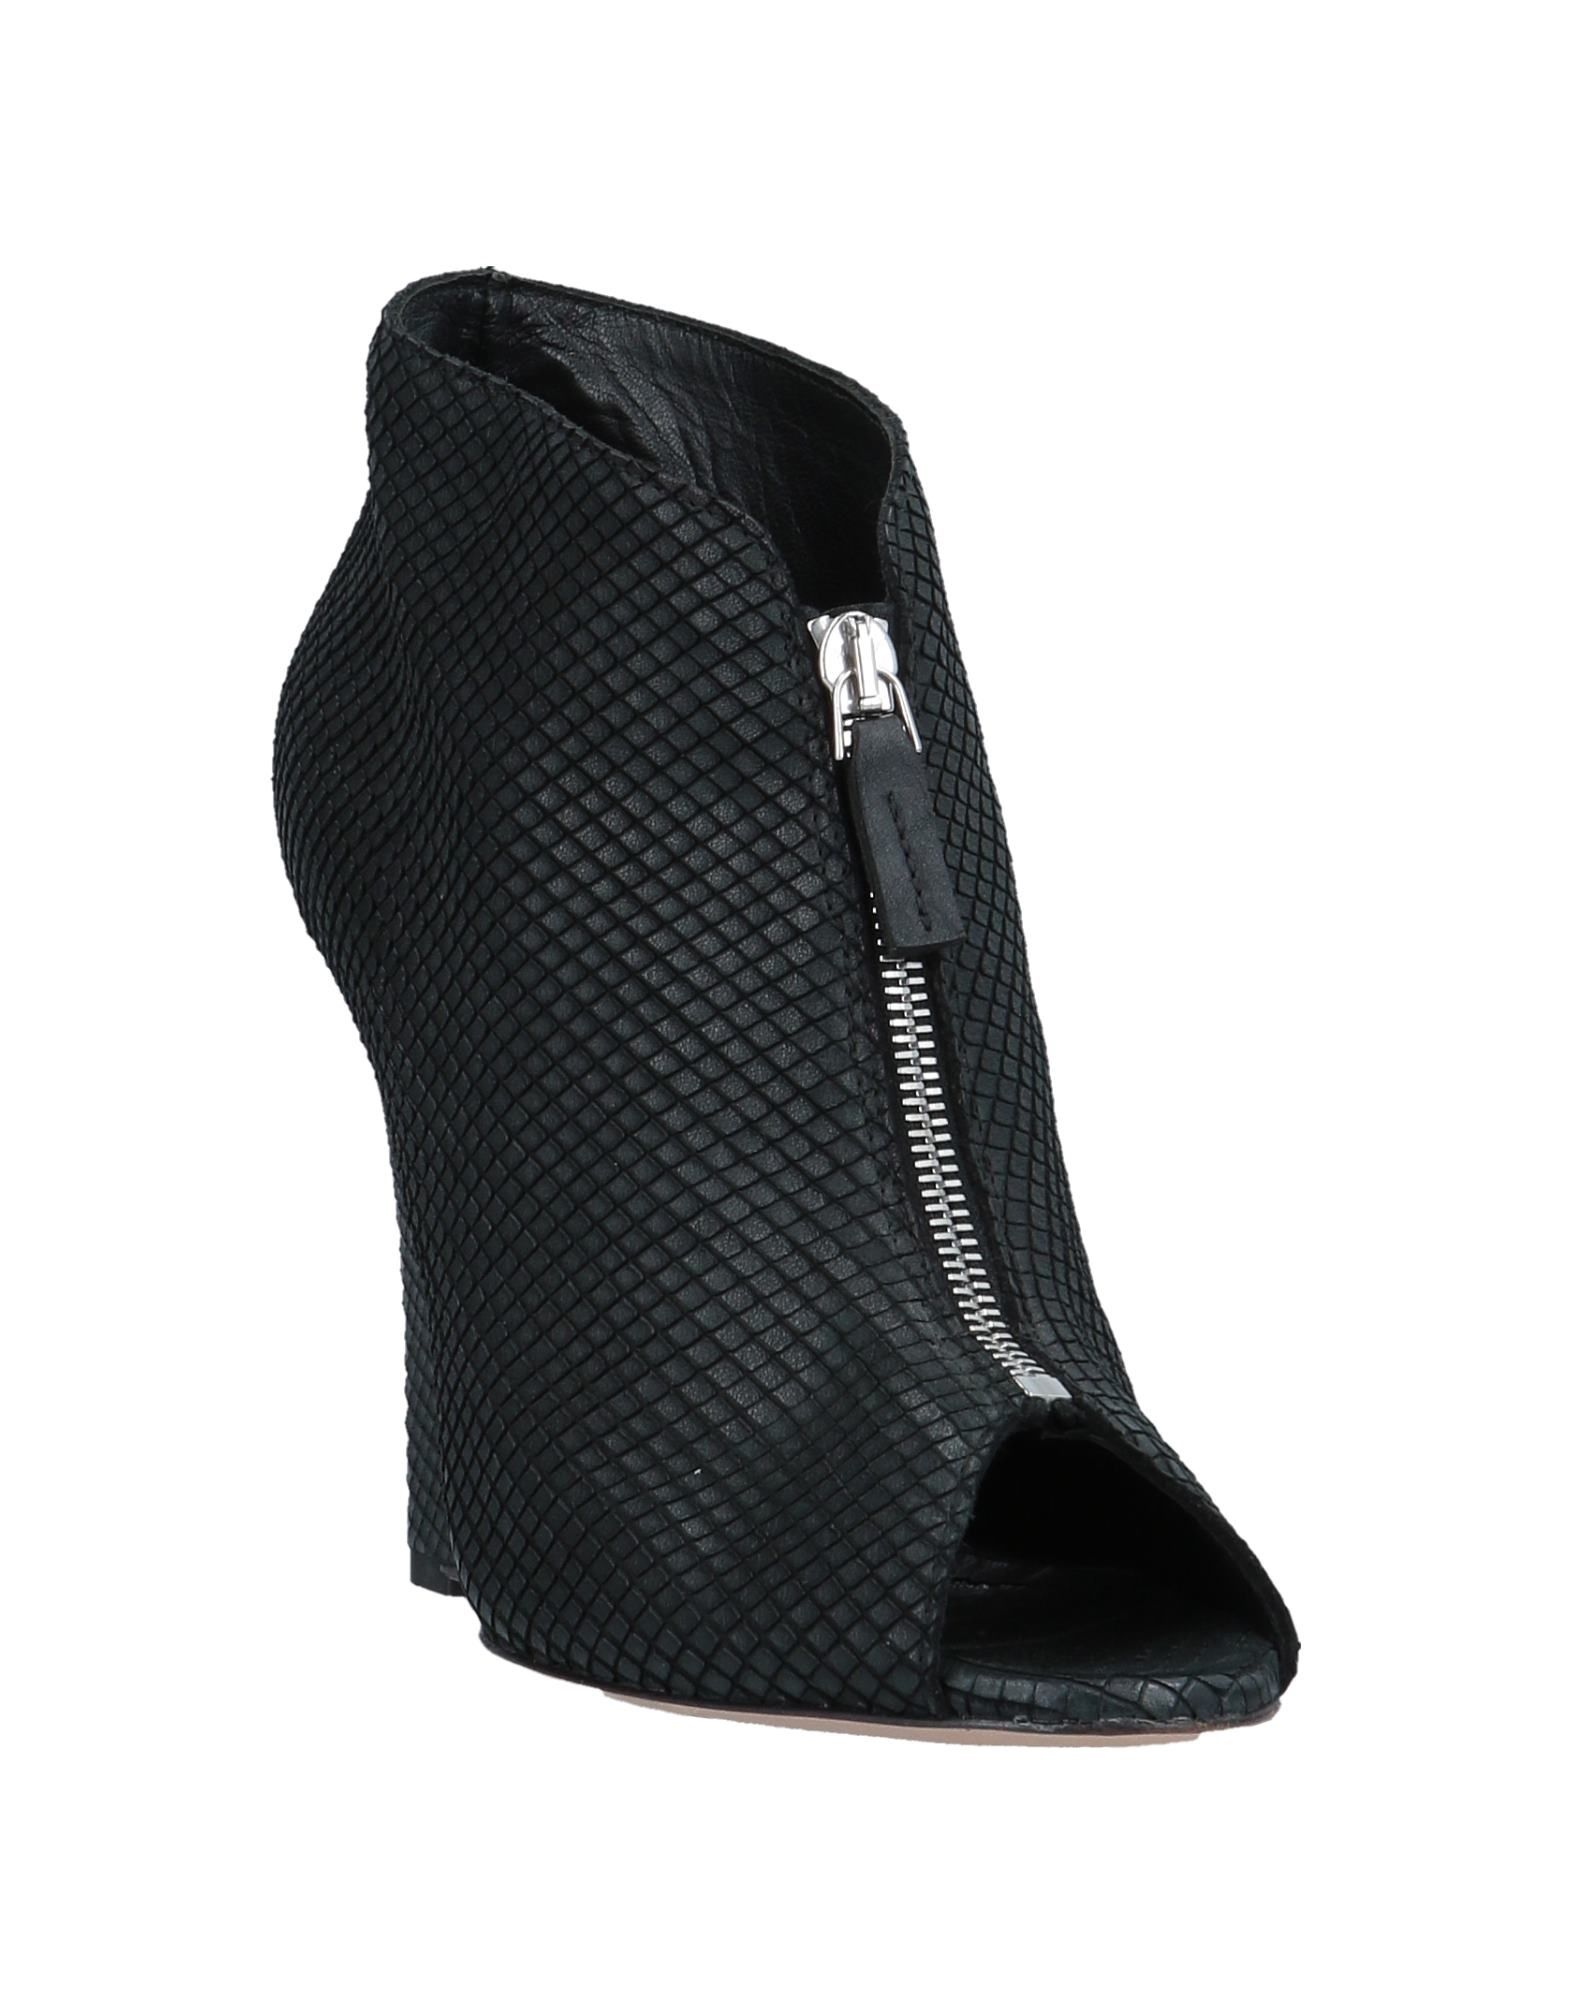 Pinko Stiefelette strapazierfähige Damen  11543480TBGut aussehende strapazierfähige Stiefelette Schuhe f3b6a1